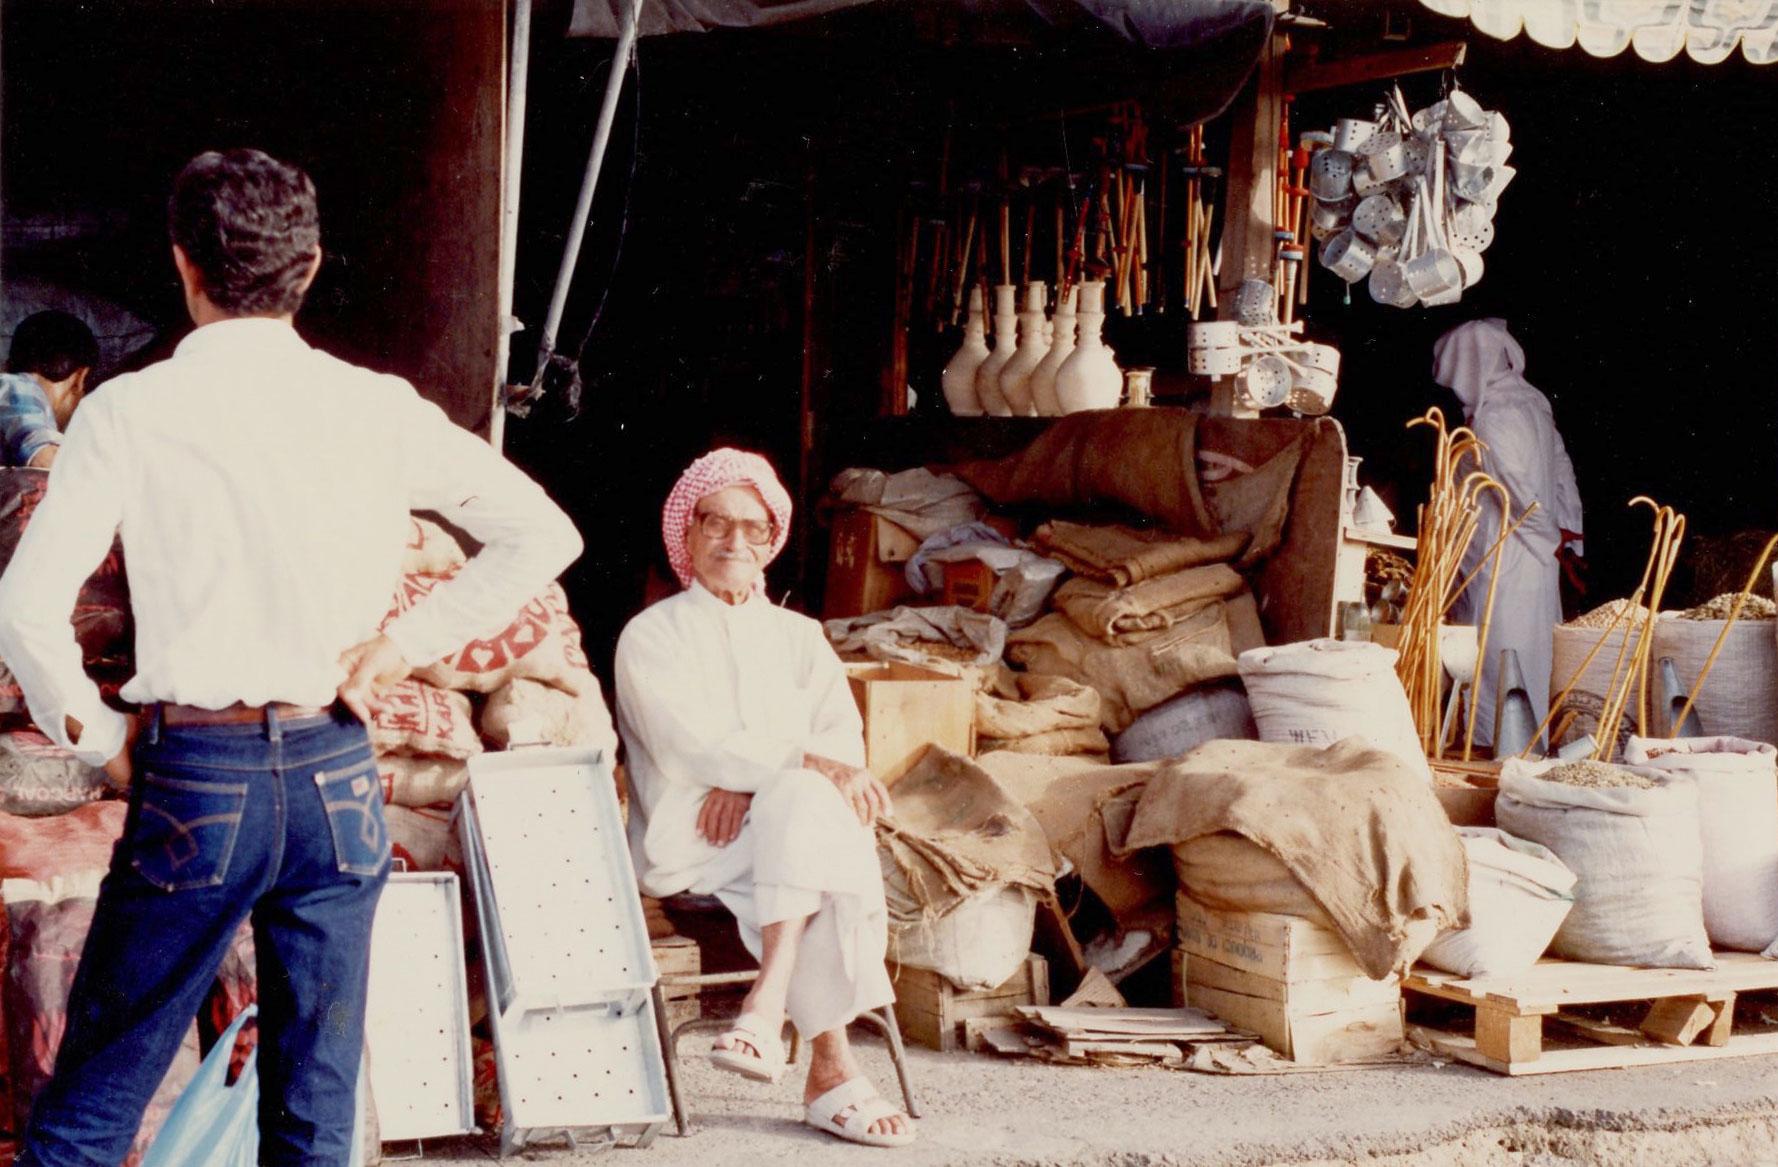 Image courtesy of Hashem Al Ajmani, Sharjah, 1980s